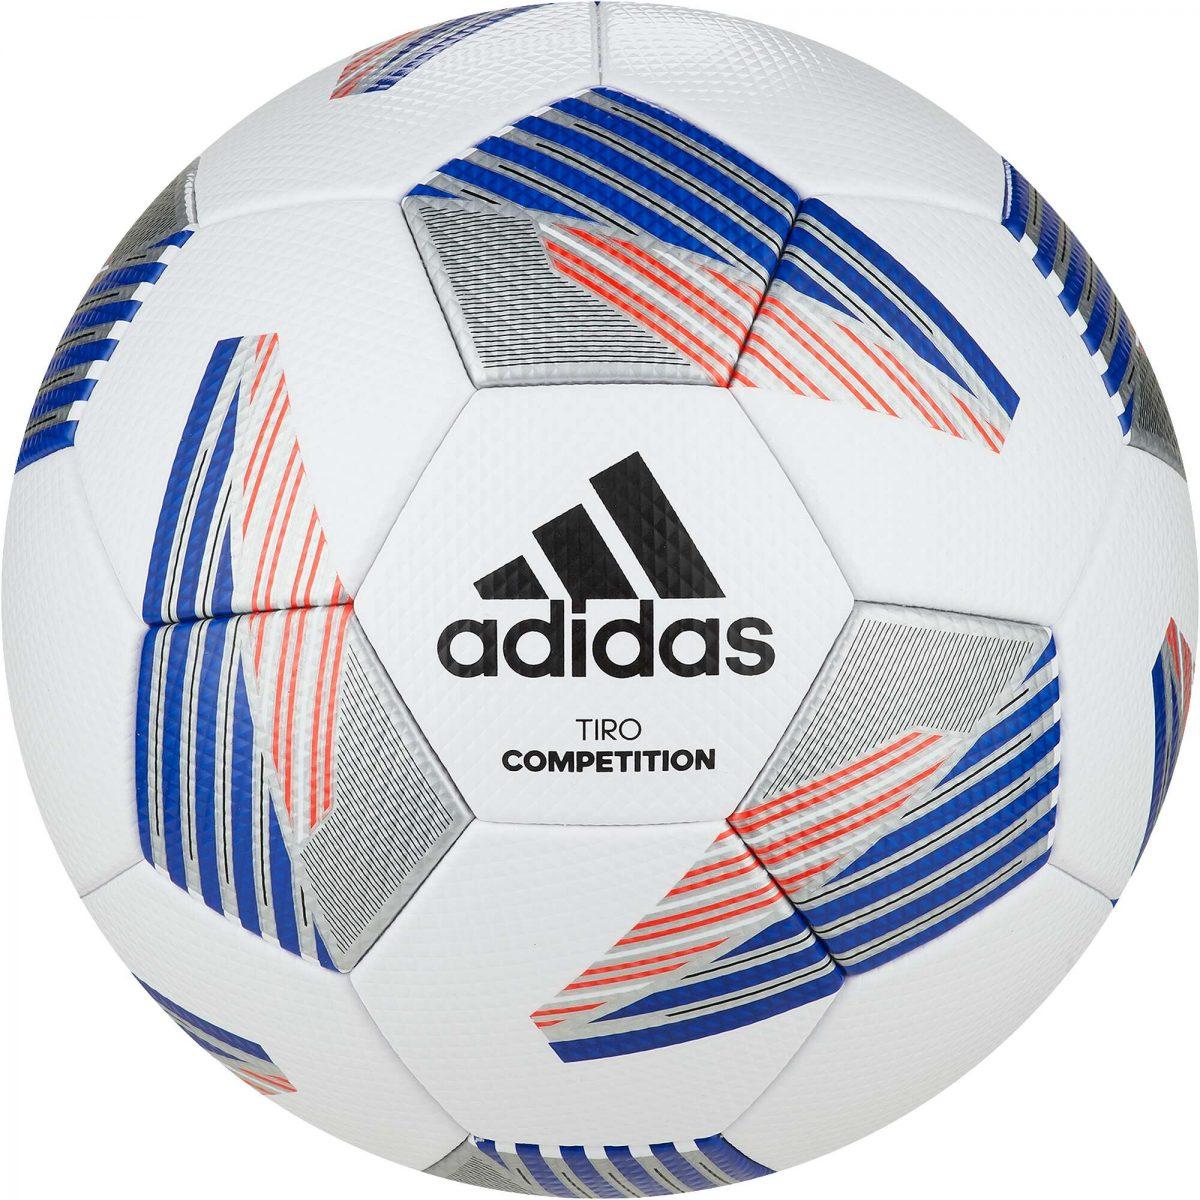 "Adidas Fußball ""Tiro Com"" - Bälle - Adidas"